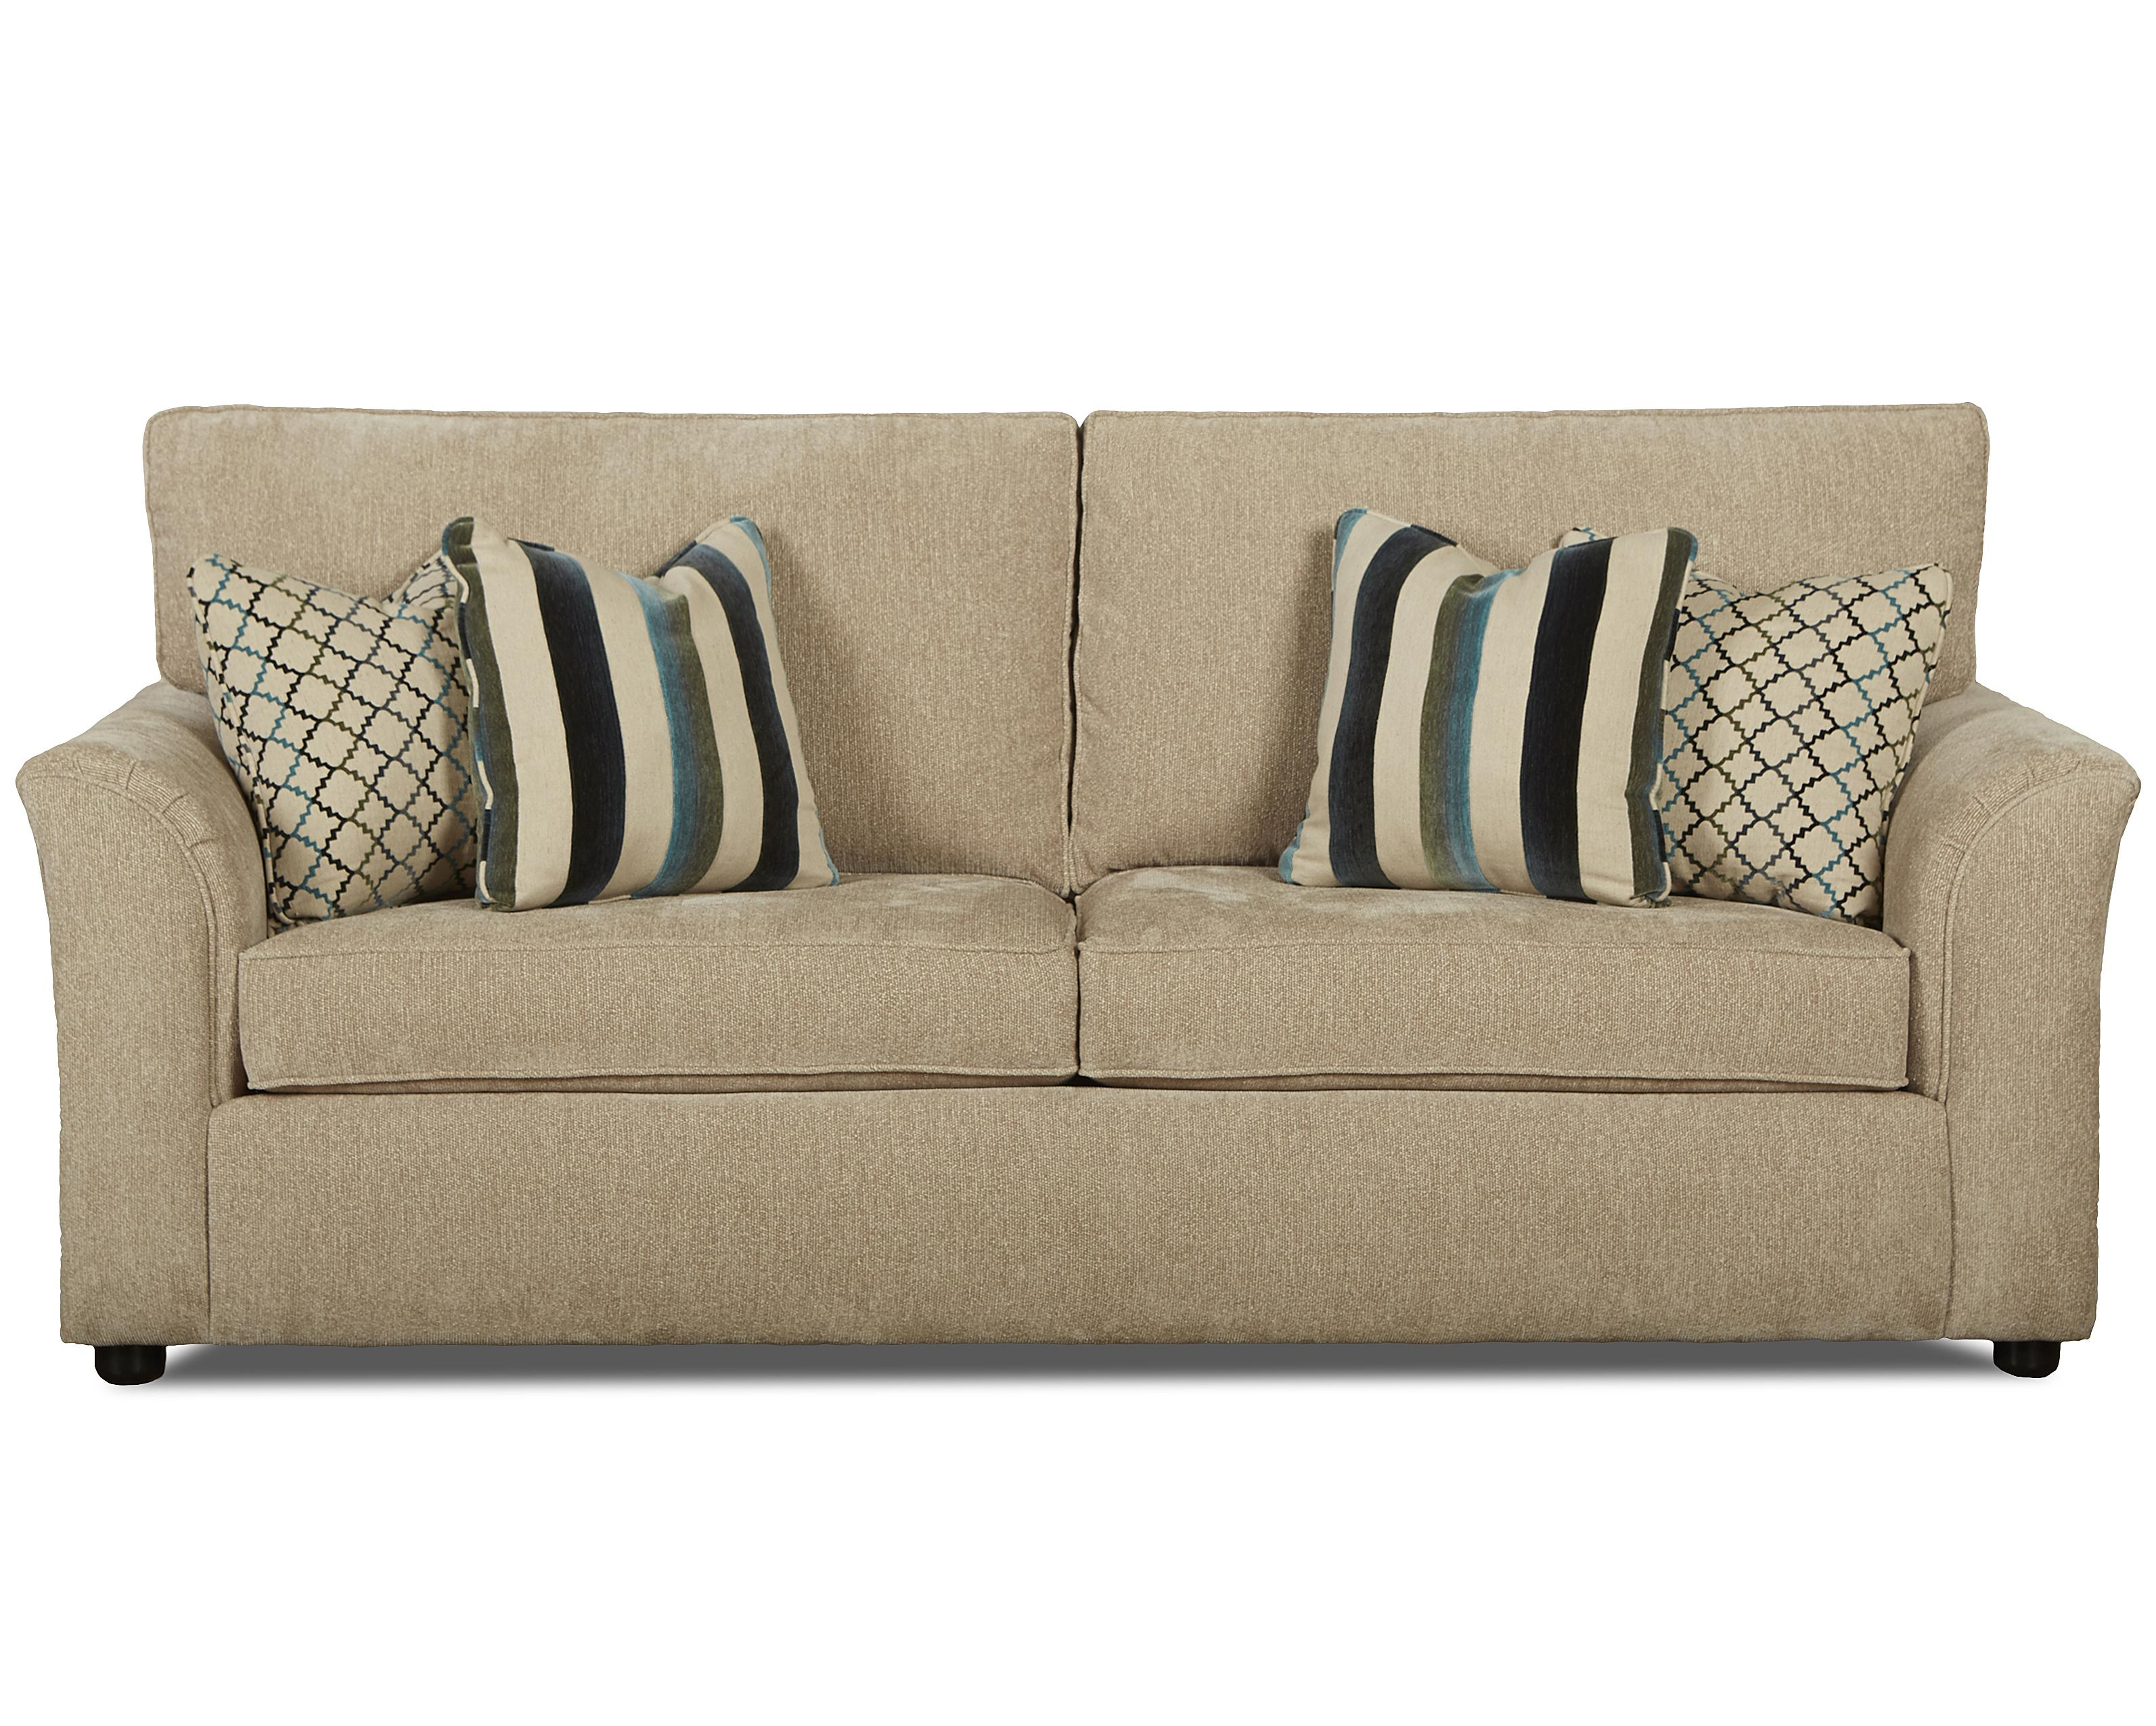 Klaussner Maya Stationary Sofa - Item Number: K12400 S